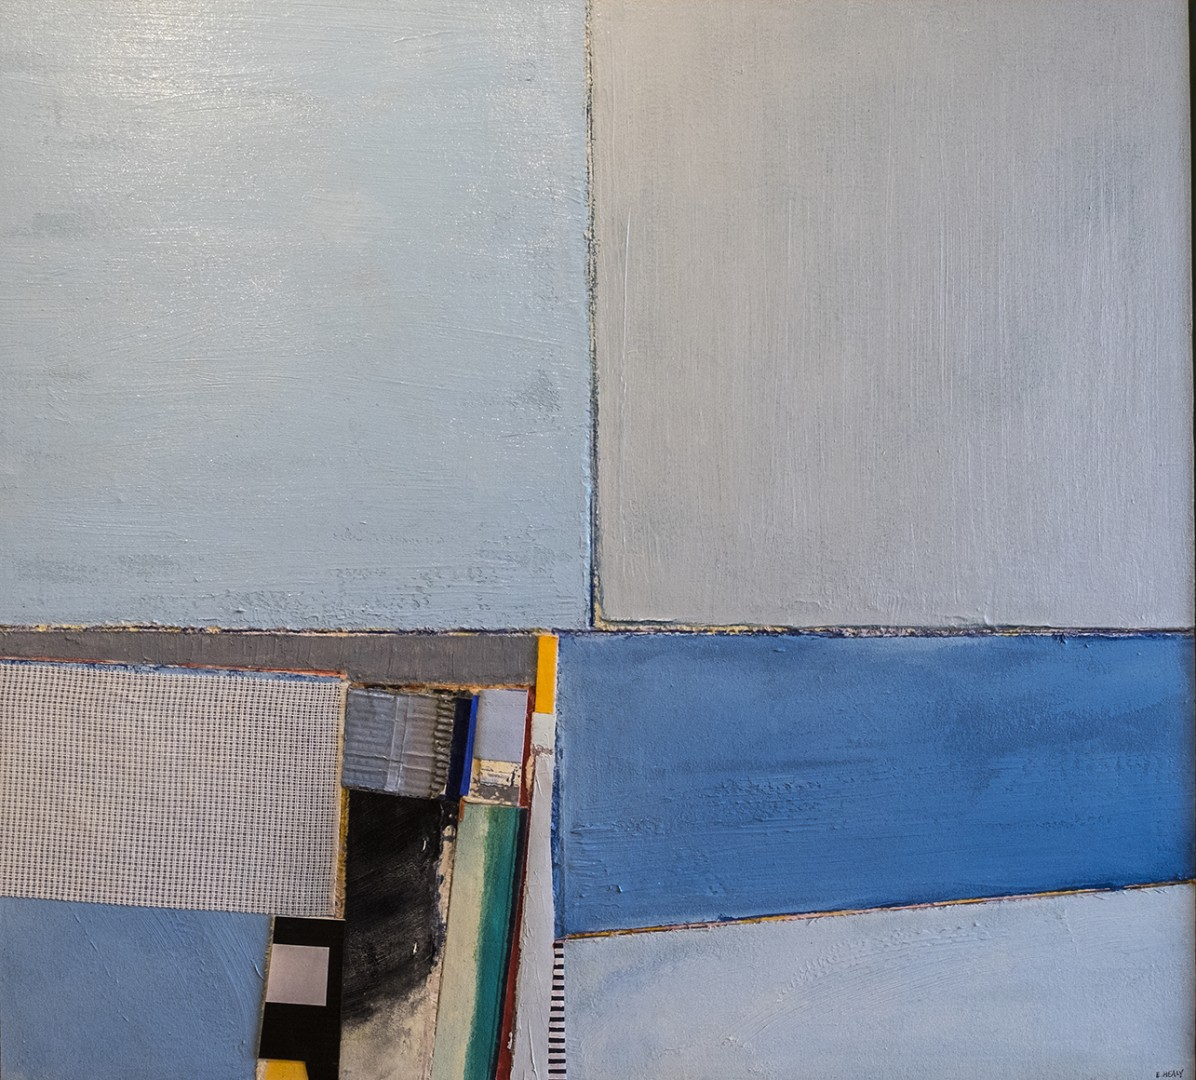 Madelyn Jordon Fine Art EUGENE HEALY: STEADY AS SHE GOES Nantucket